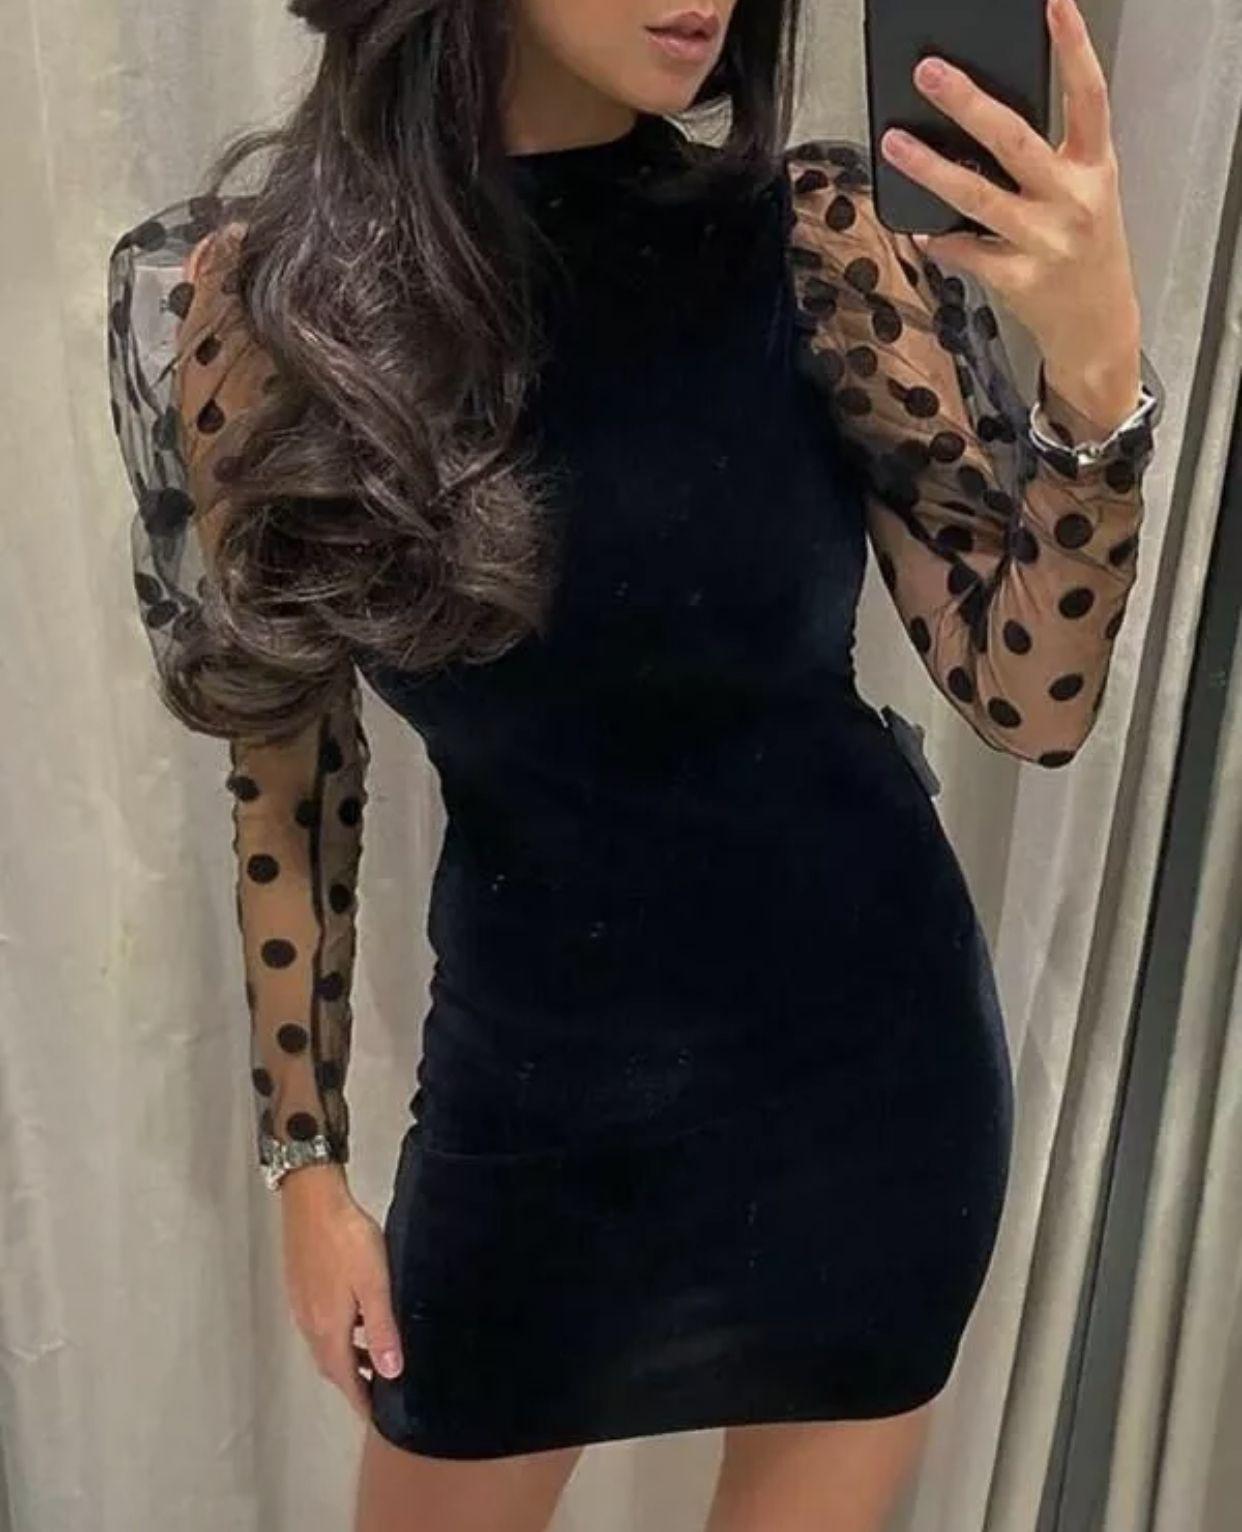 Redd S Little Black Number Long Sleeve Open Back Dress In 2020 Backless Bodycon Dresses Sheer Long Sleeve Dress Bodycon Dress [ 1532 x 1242 Pixel ]